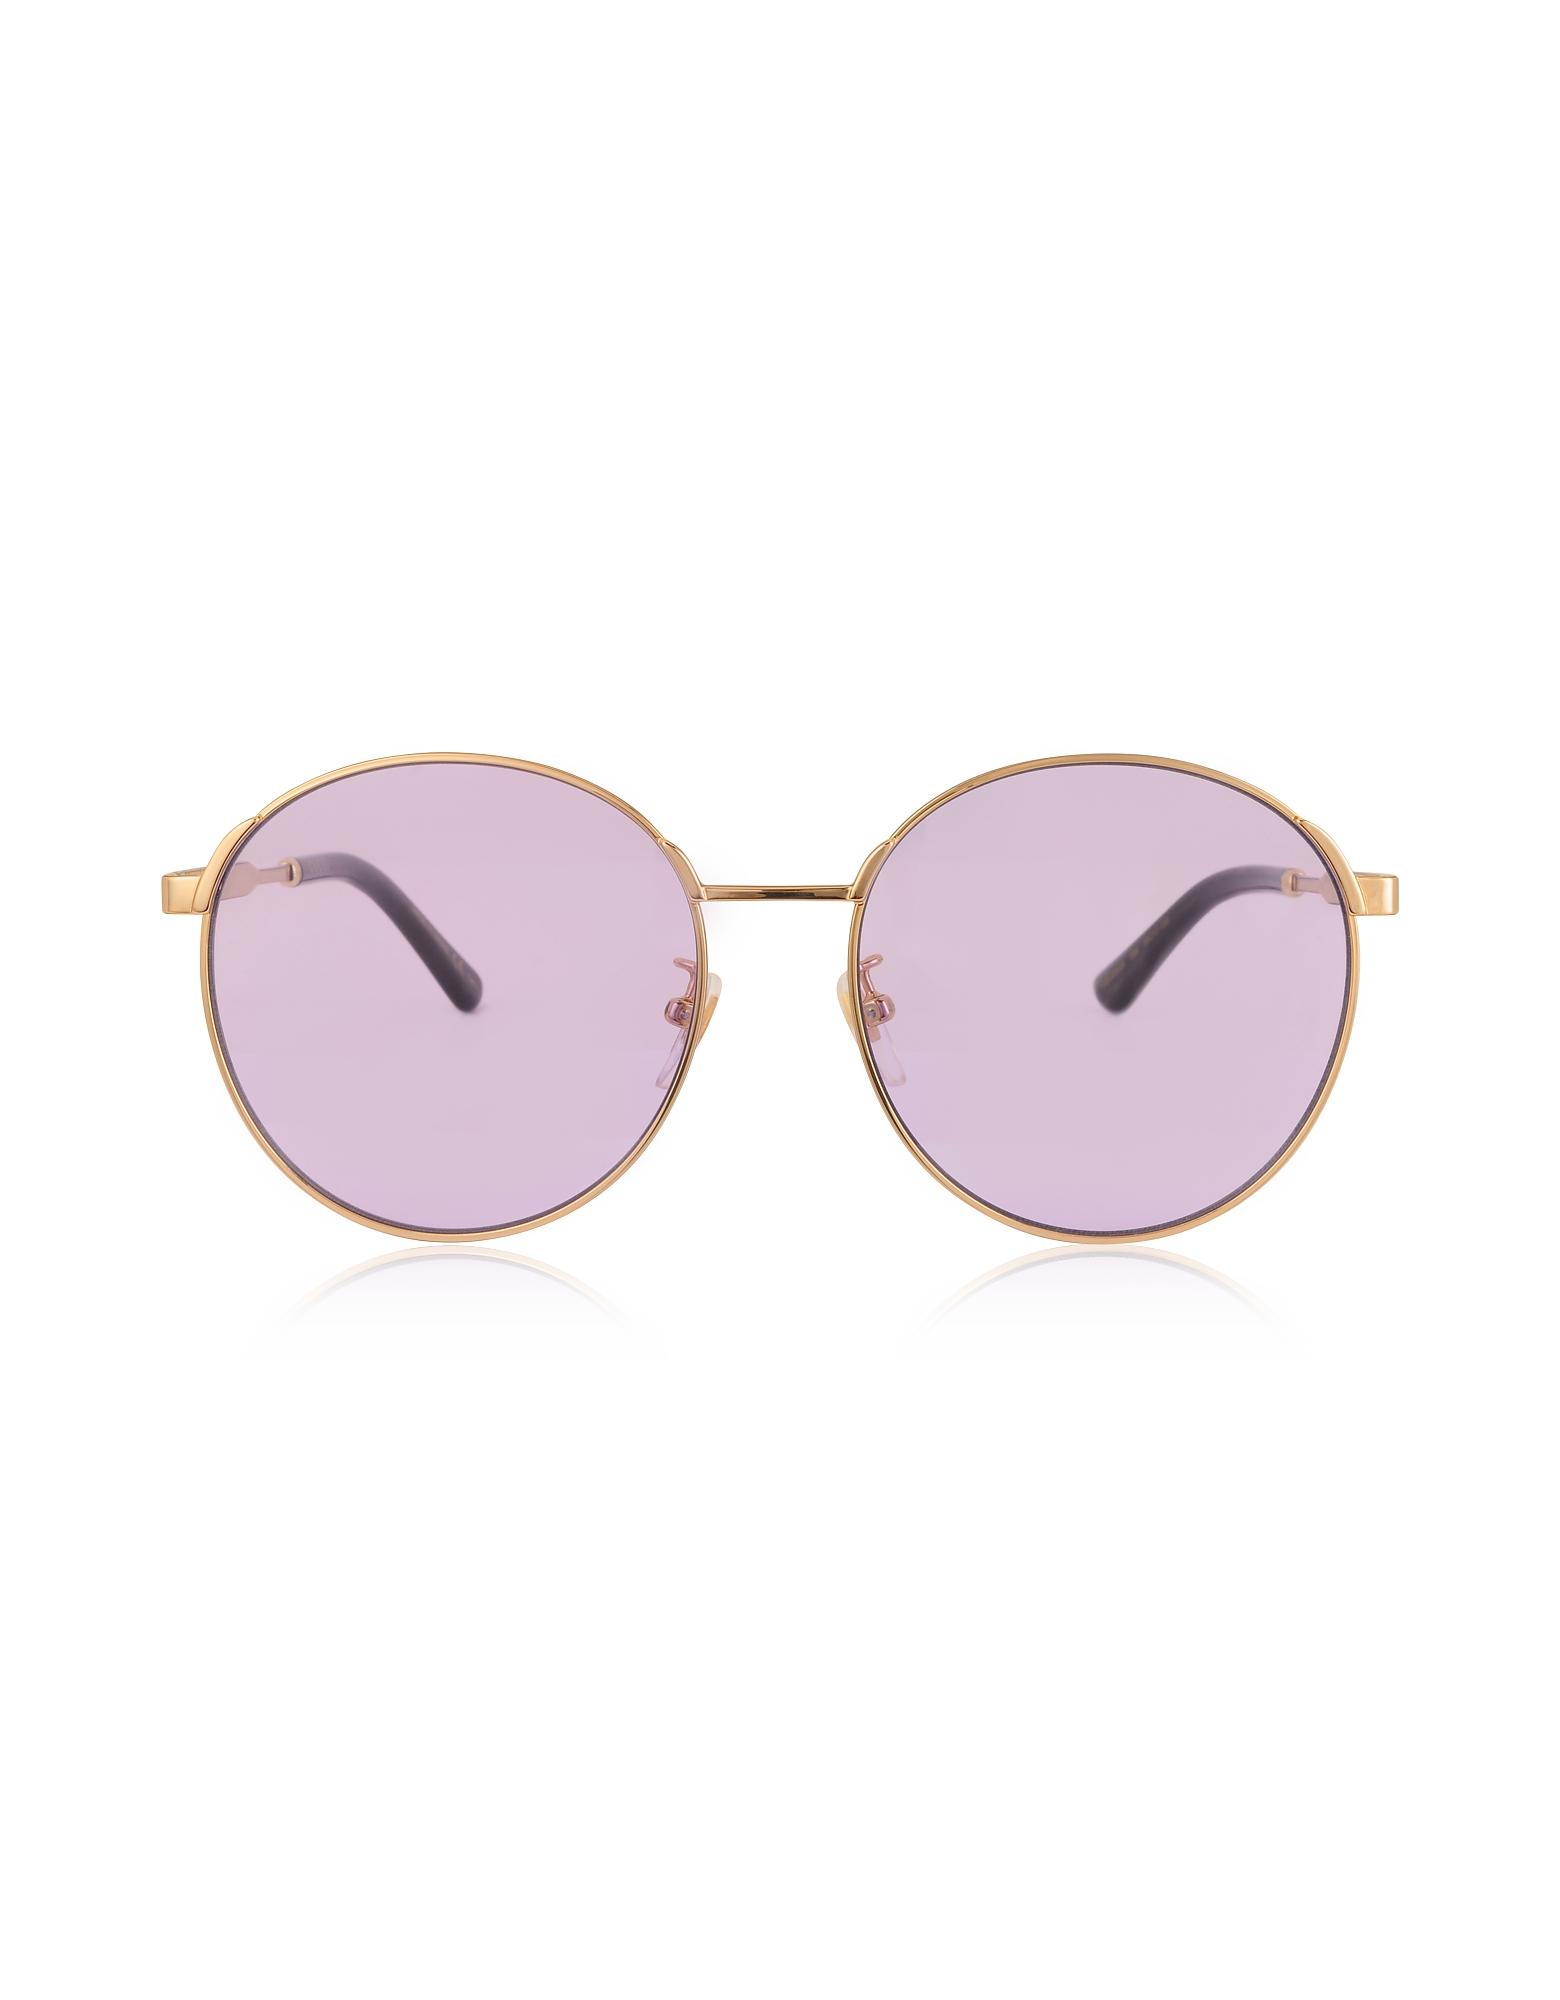 Gucci Designer Sunglasses, GG0206SK 006 Round-frame Metal Sunglasses